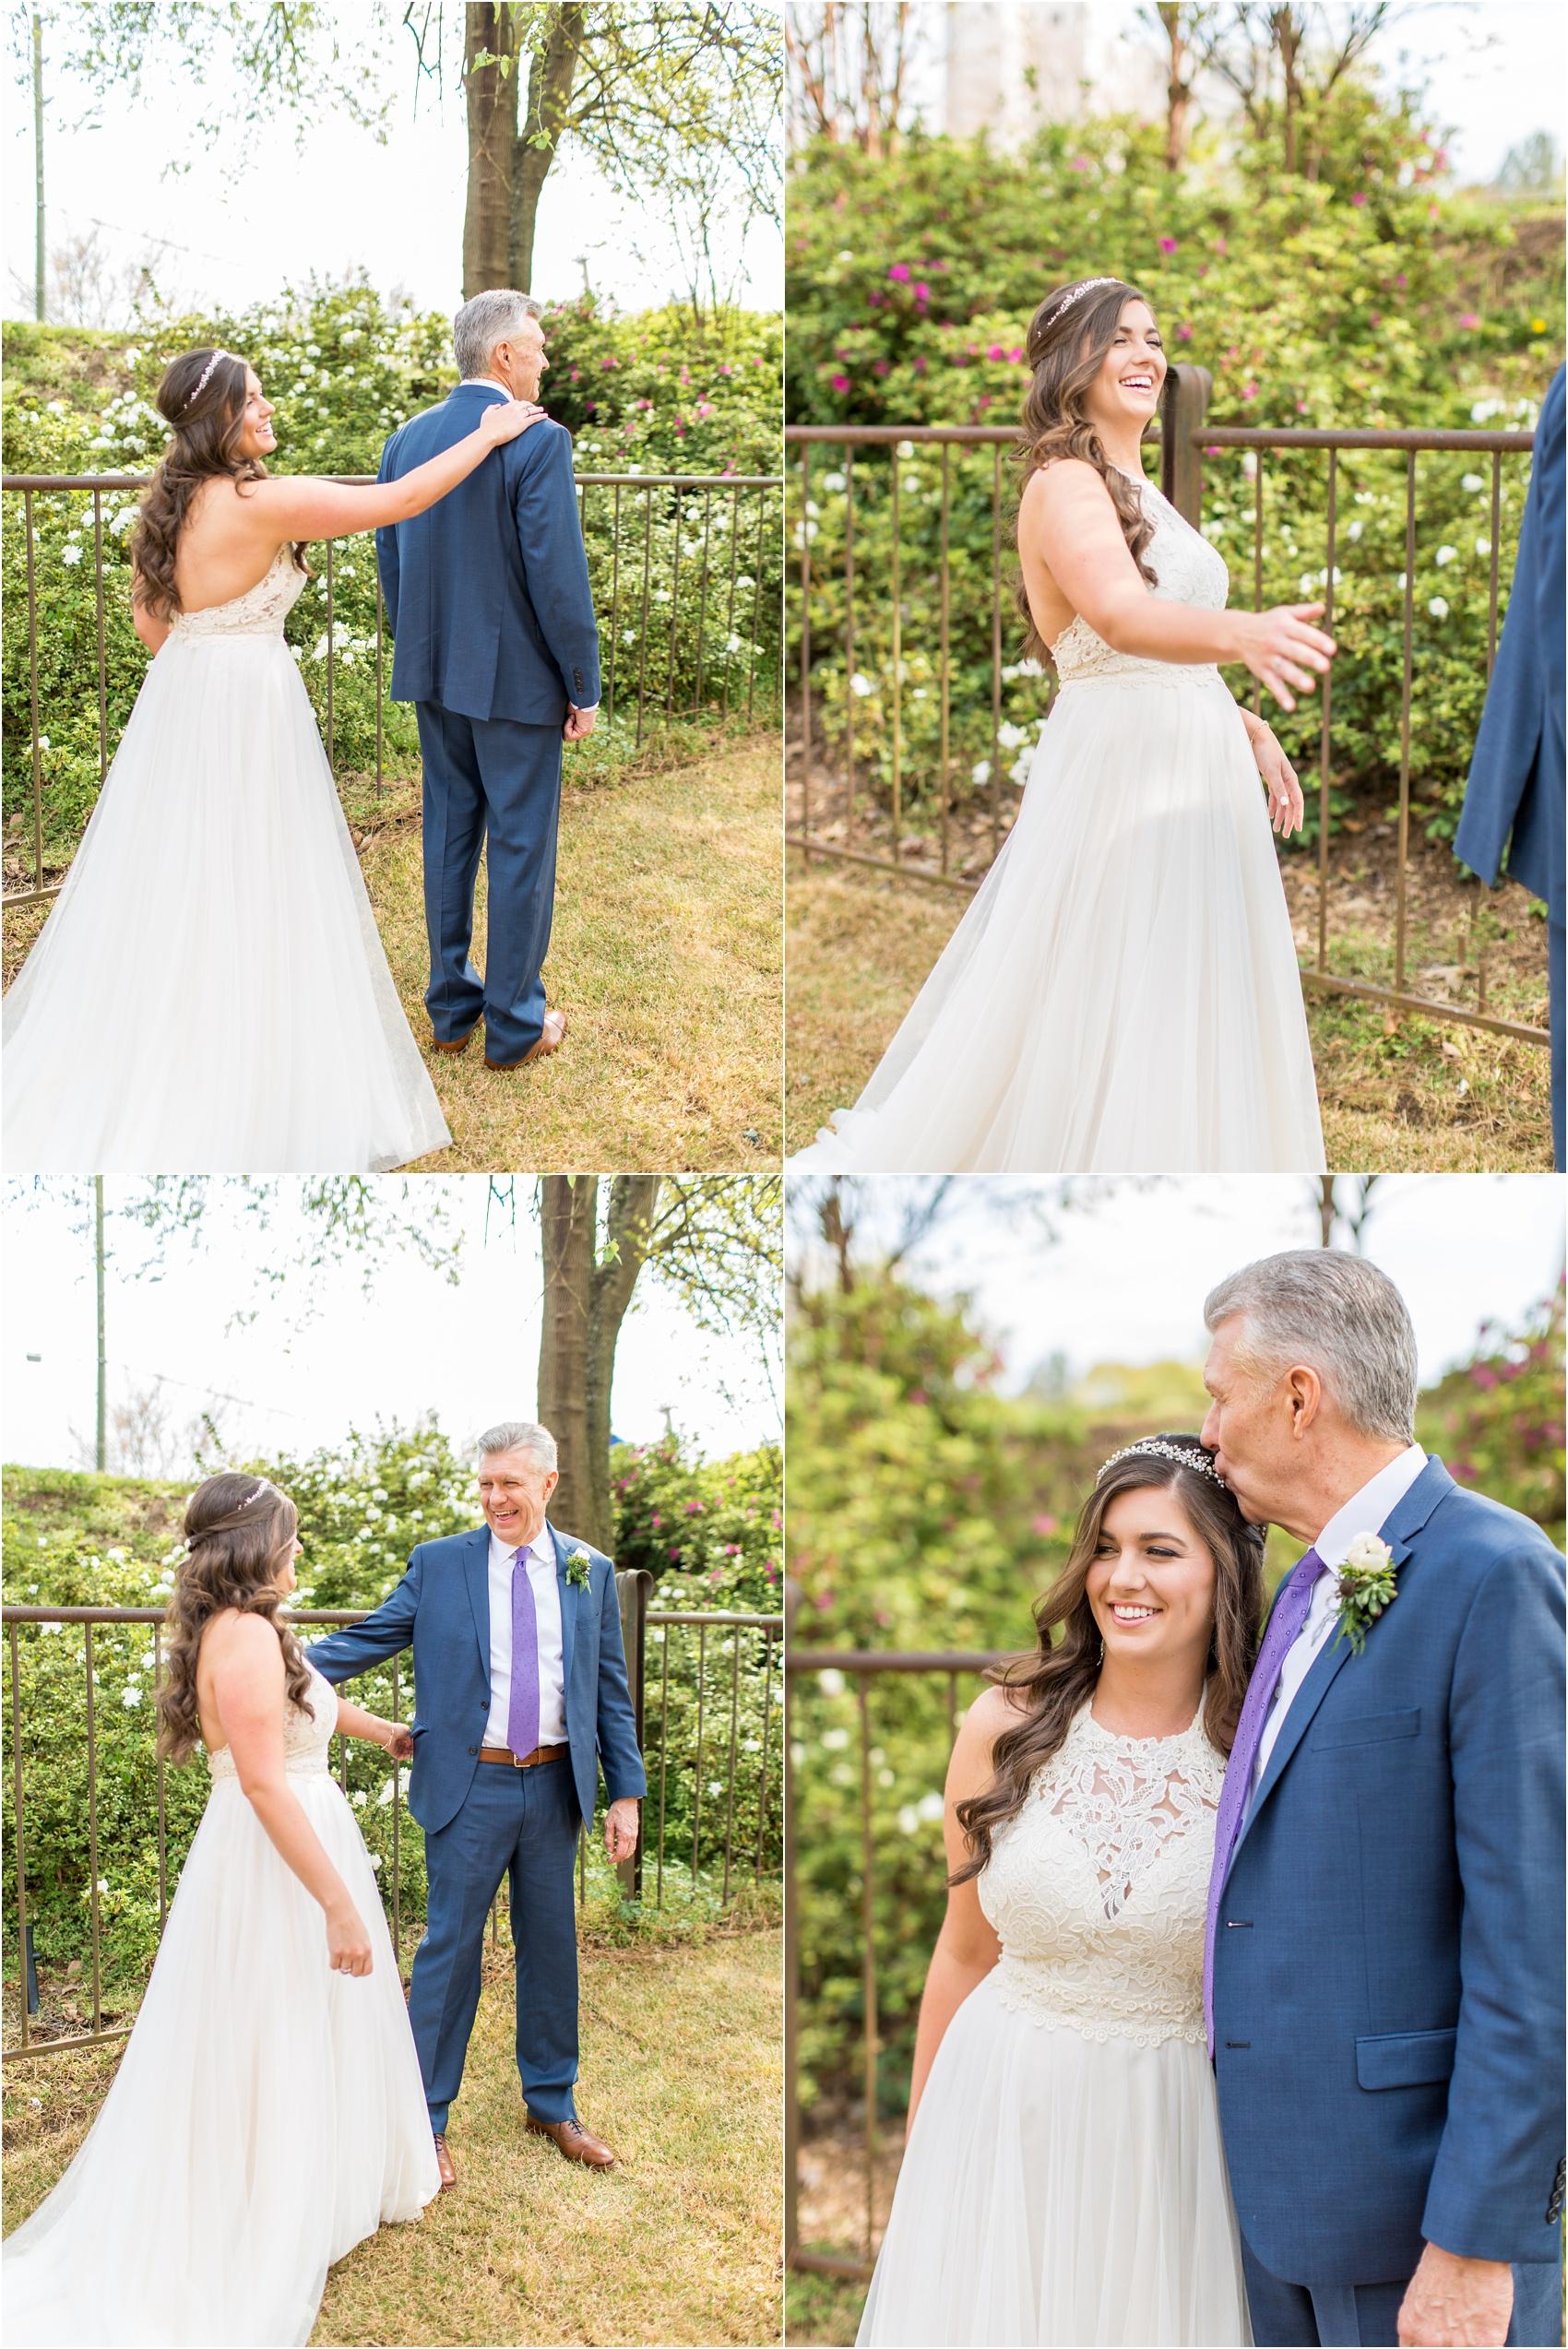 Savannah Eve Photography- Groseclose Wedding- Blog-11.jpg